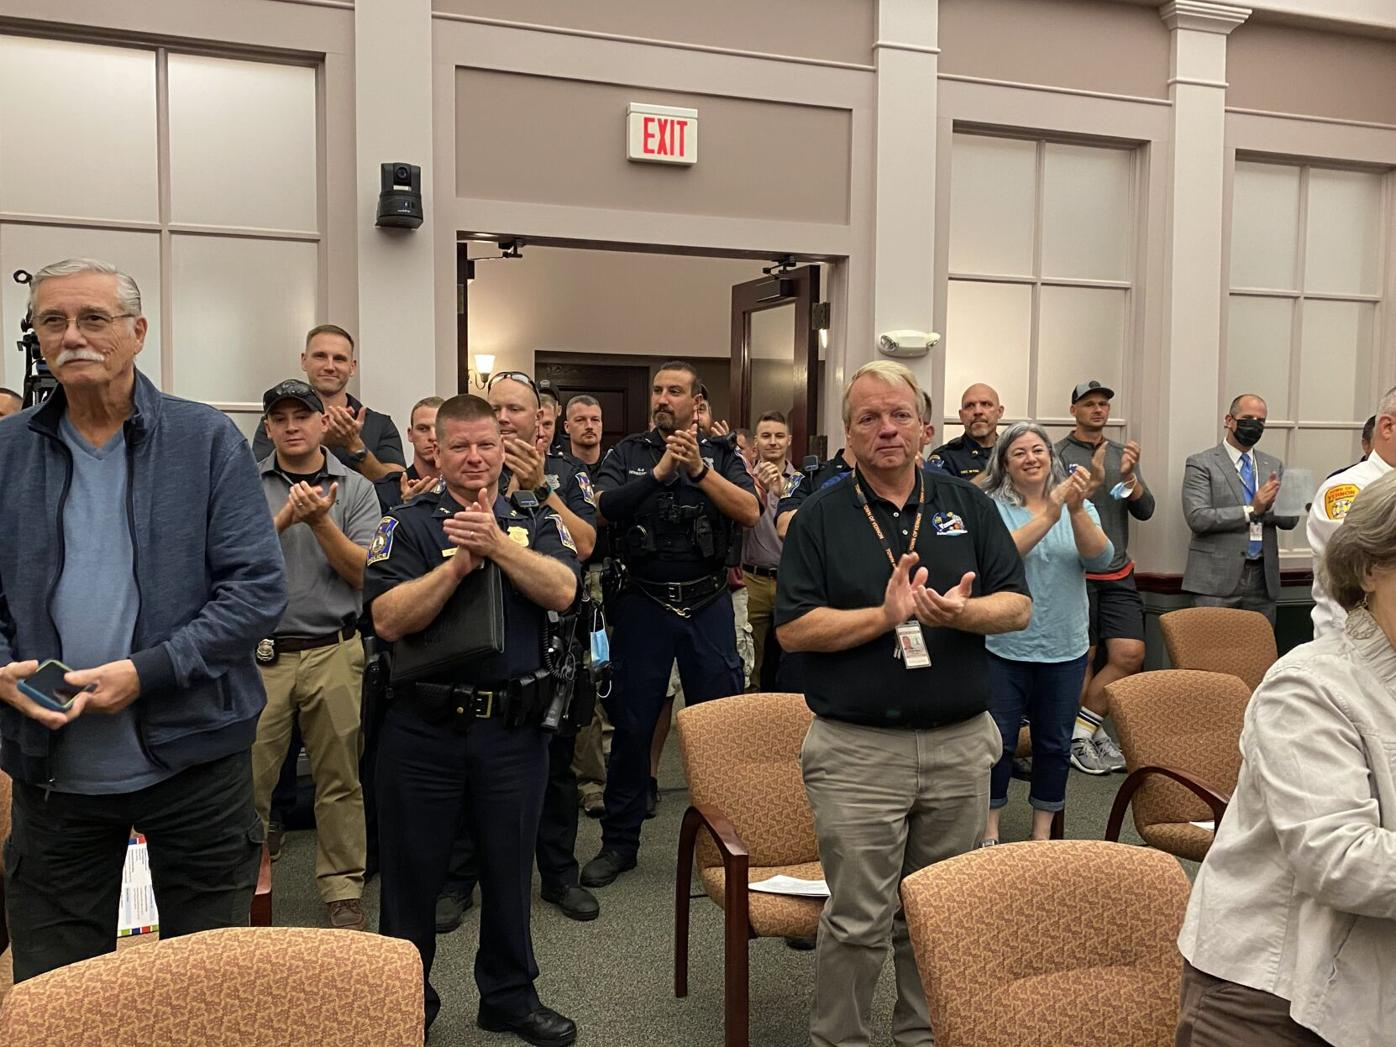 Crowd cheers as Captain Lucas Gallant sworn in